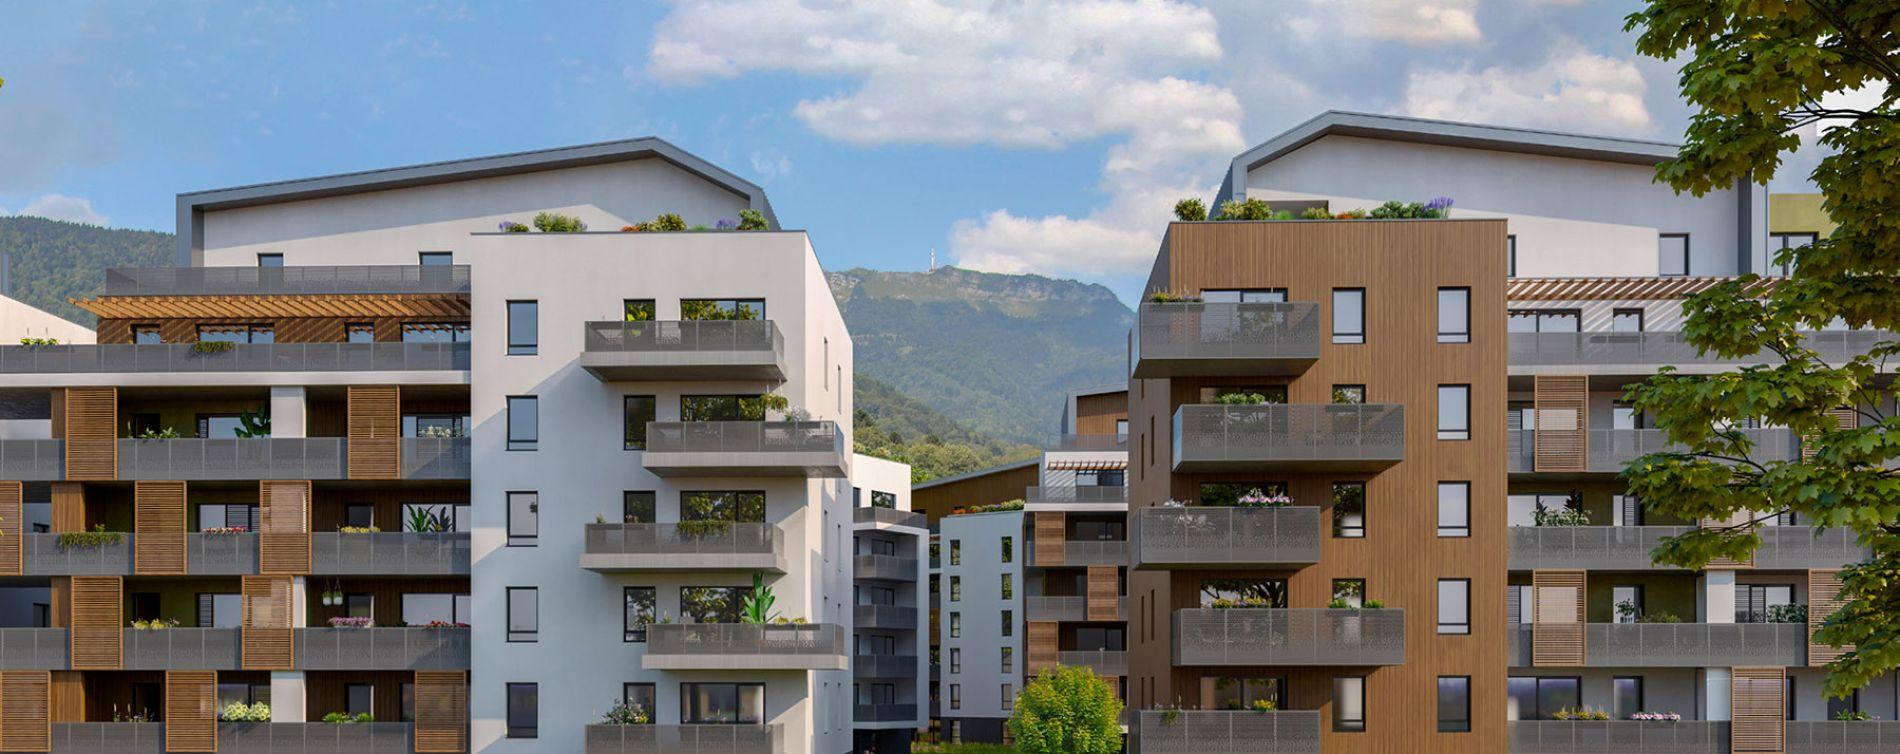 Gex : programme immobilier neuve « Terres Harmonie »